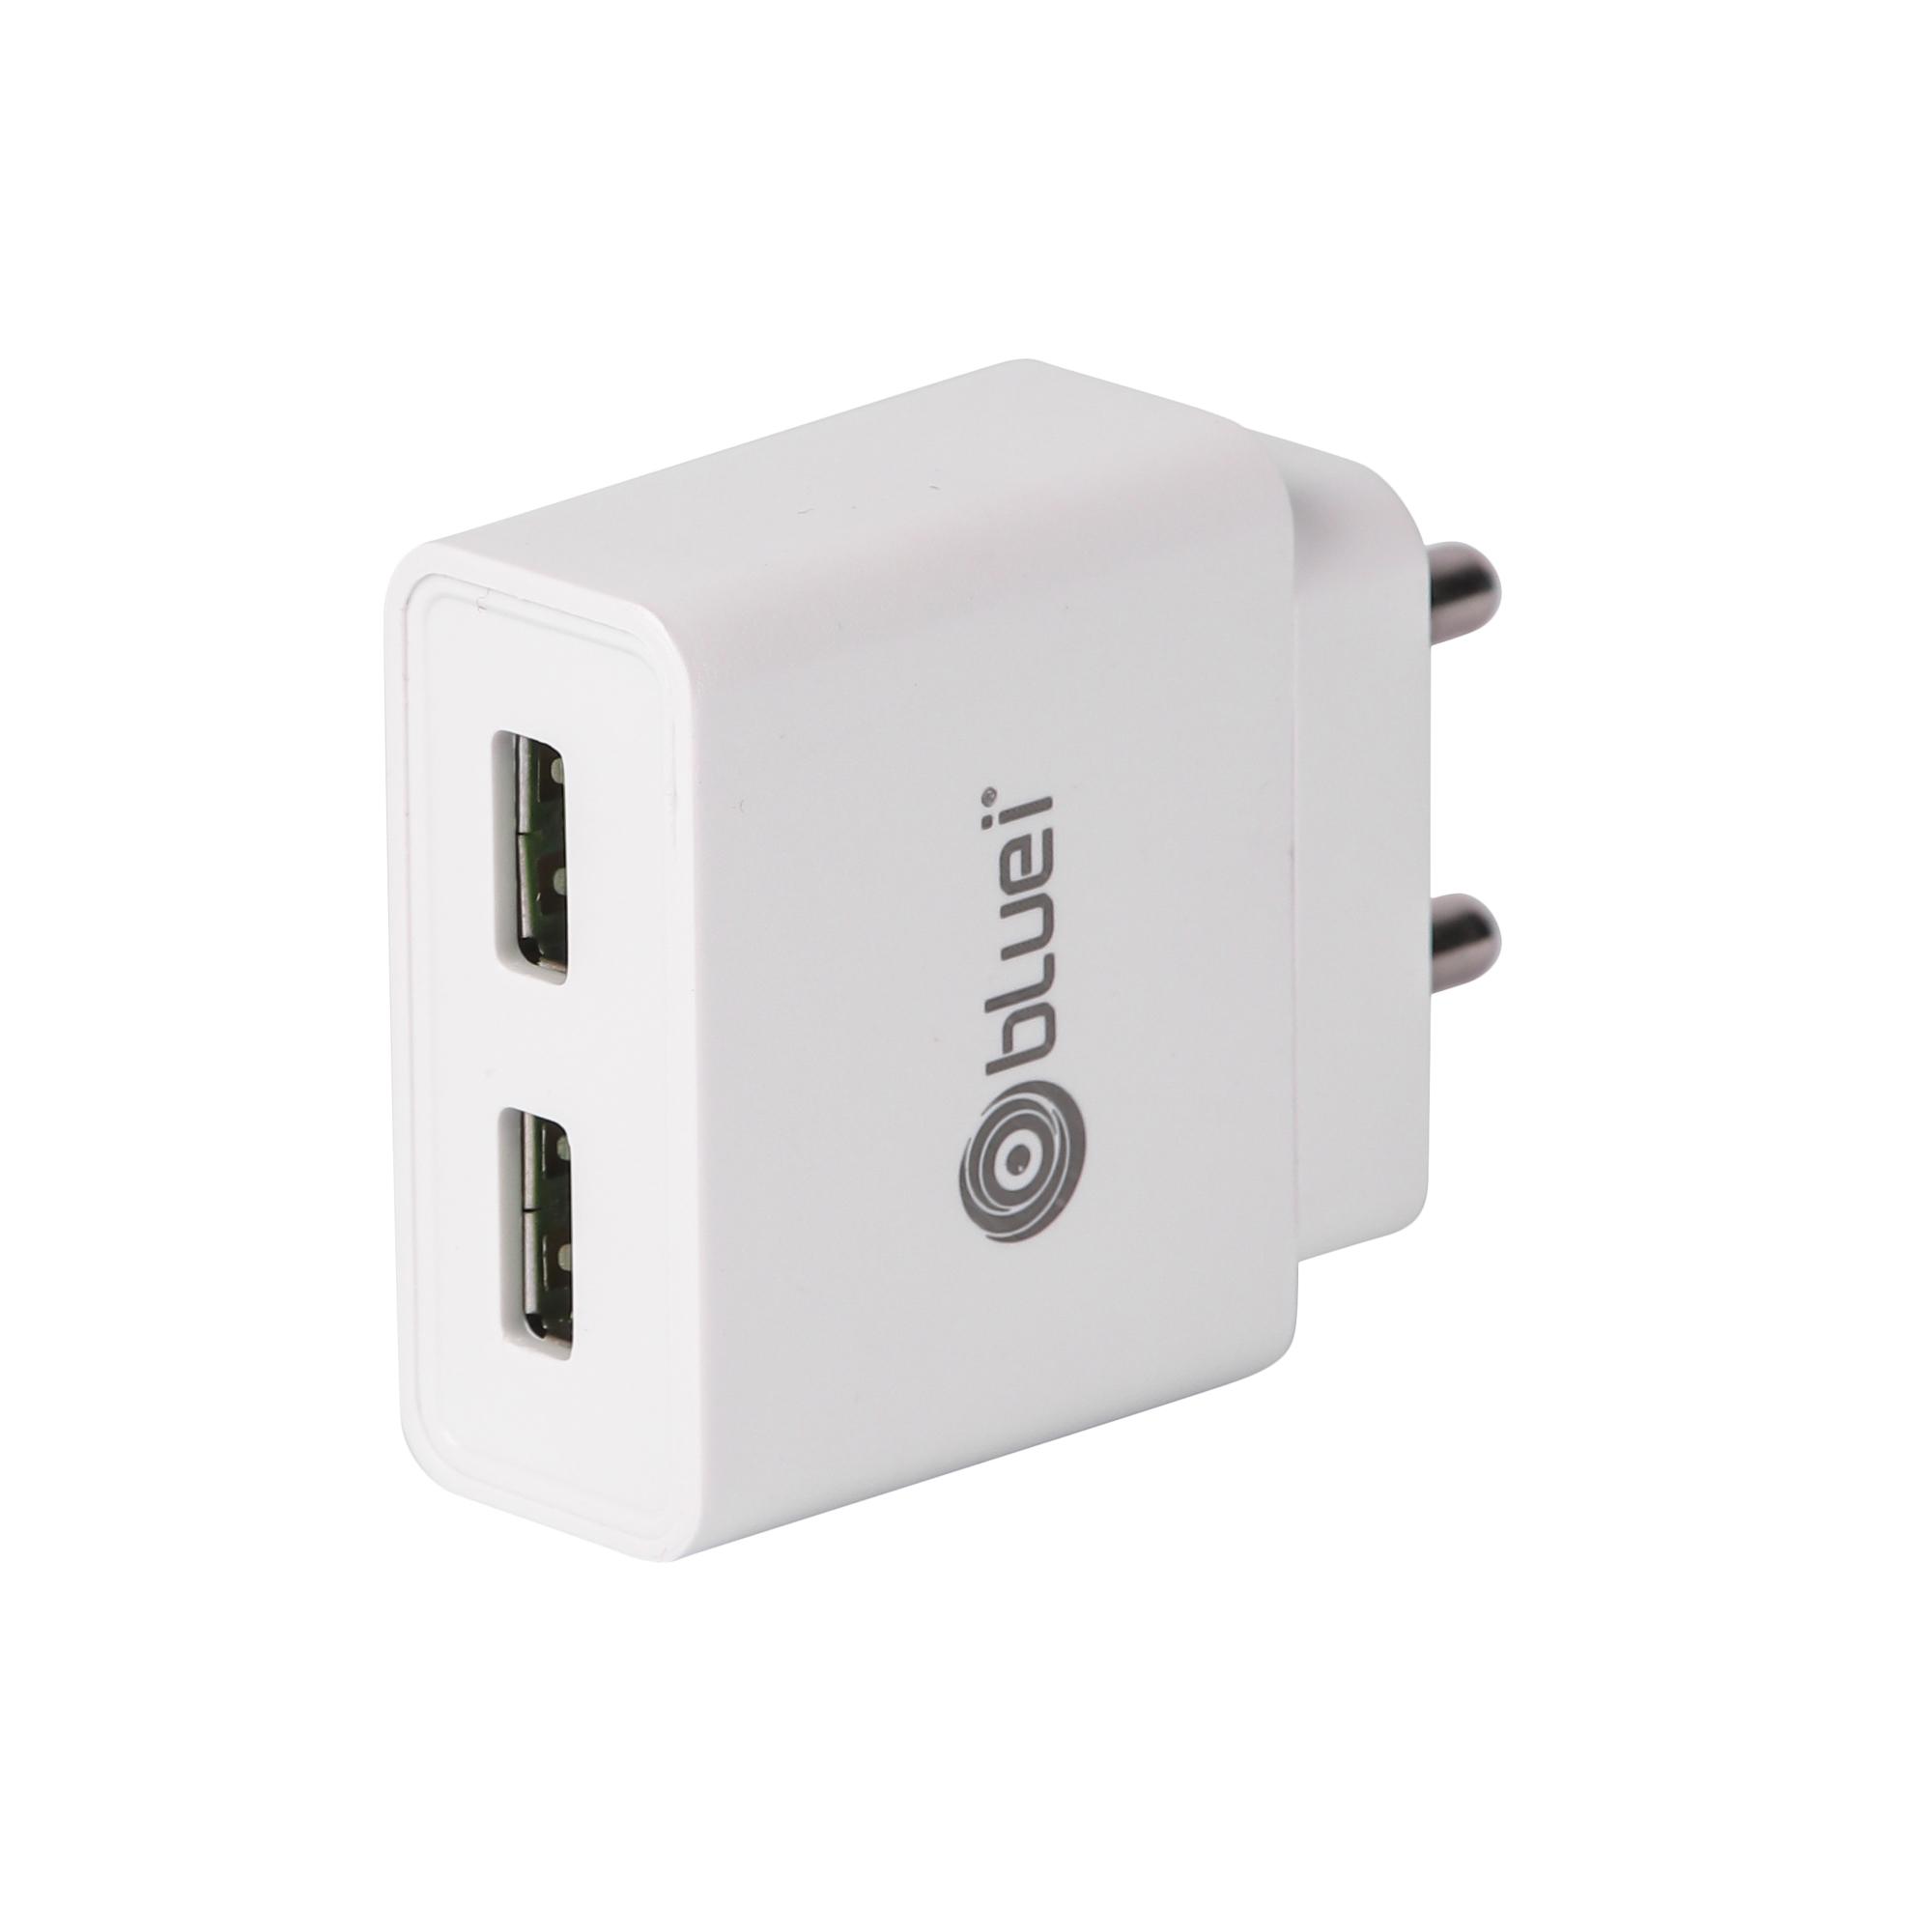 TC-01 (Basic)  2.8A Dual USB Charger